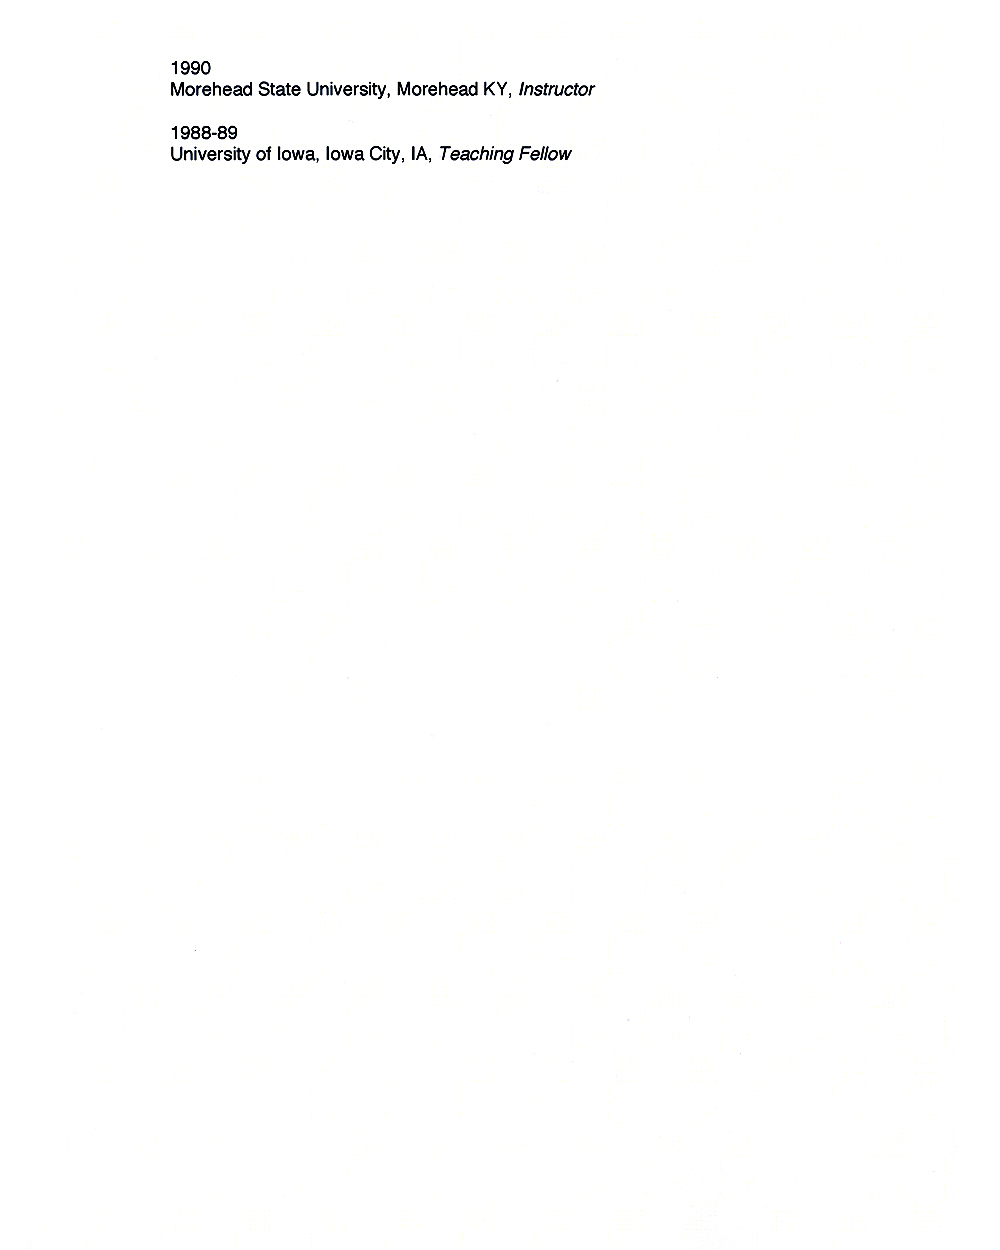 Cynthia Lin's Resume, pg 4